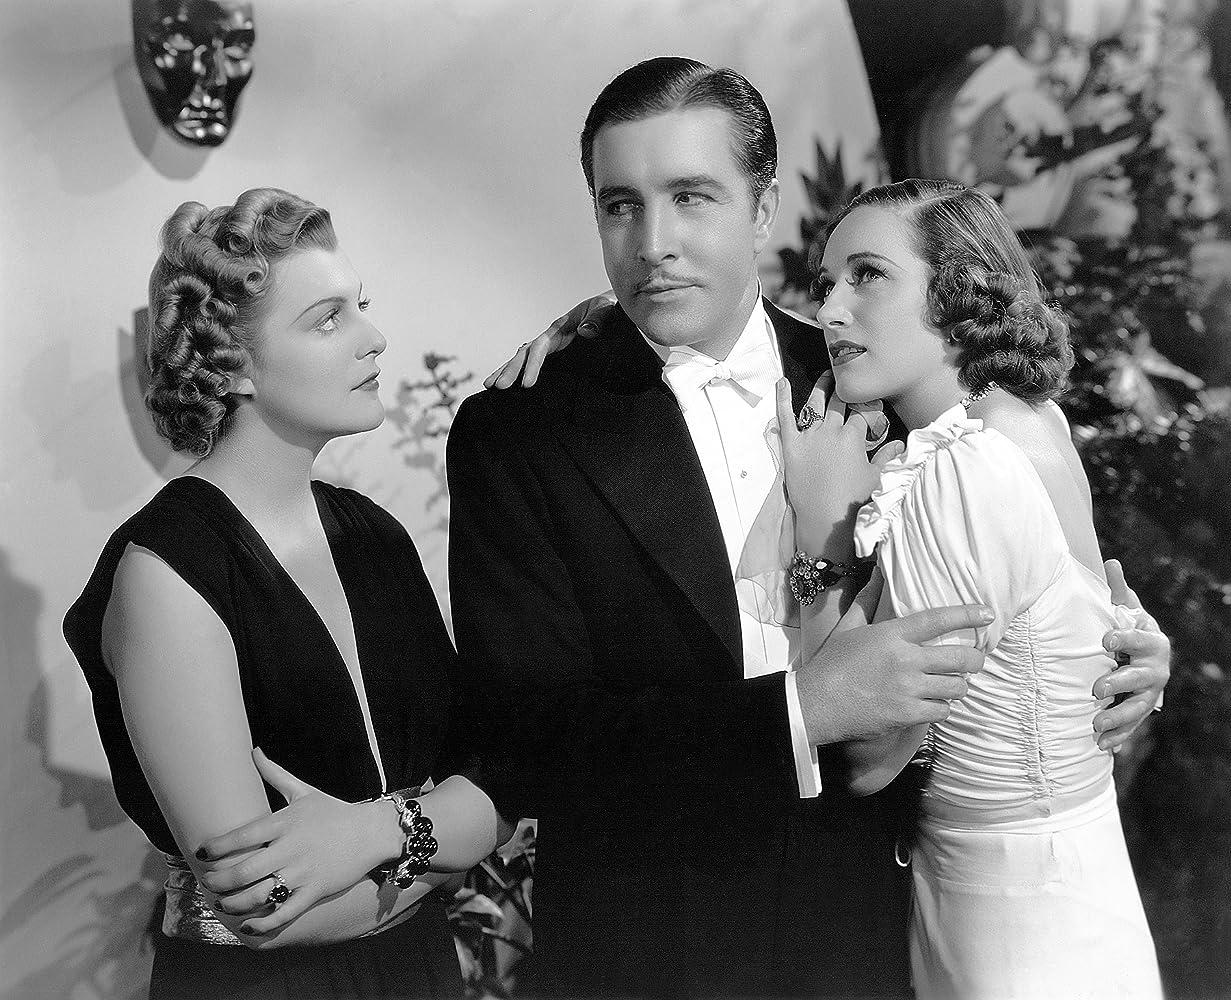 Tala Birell, John Boles, and Esther Ralston in As Good as Married (1937)